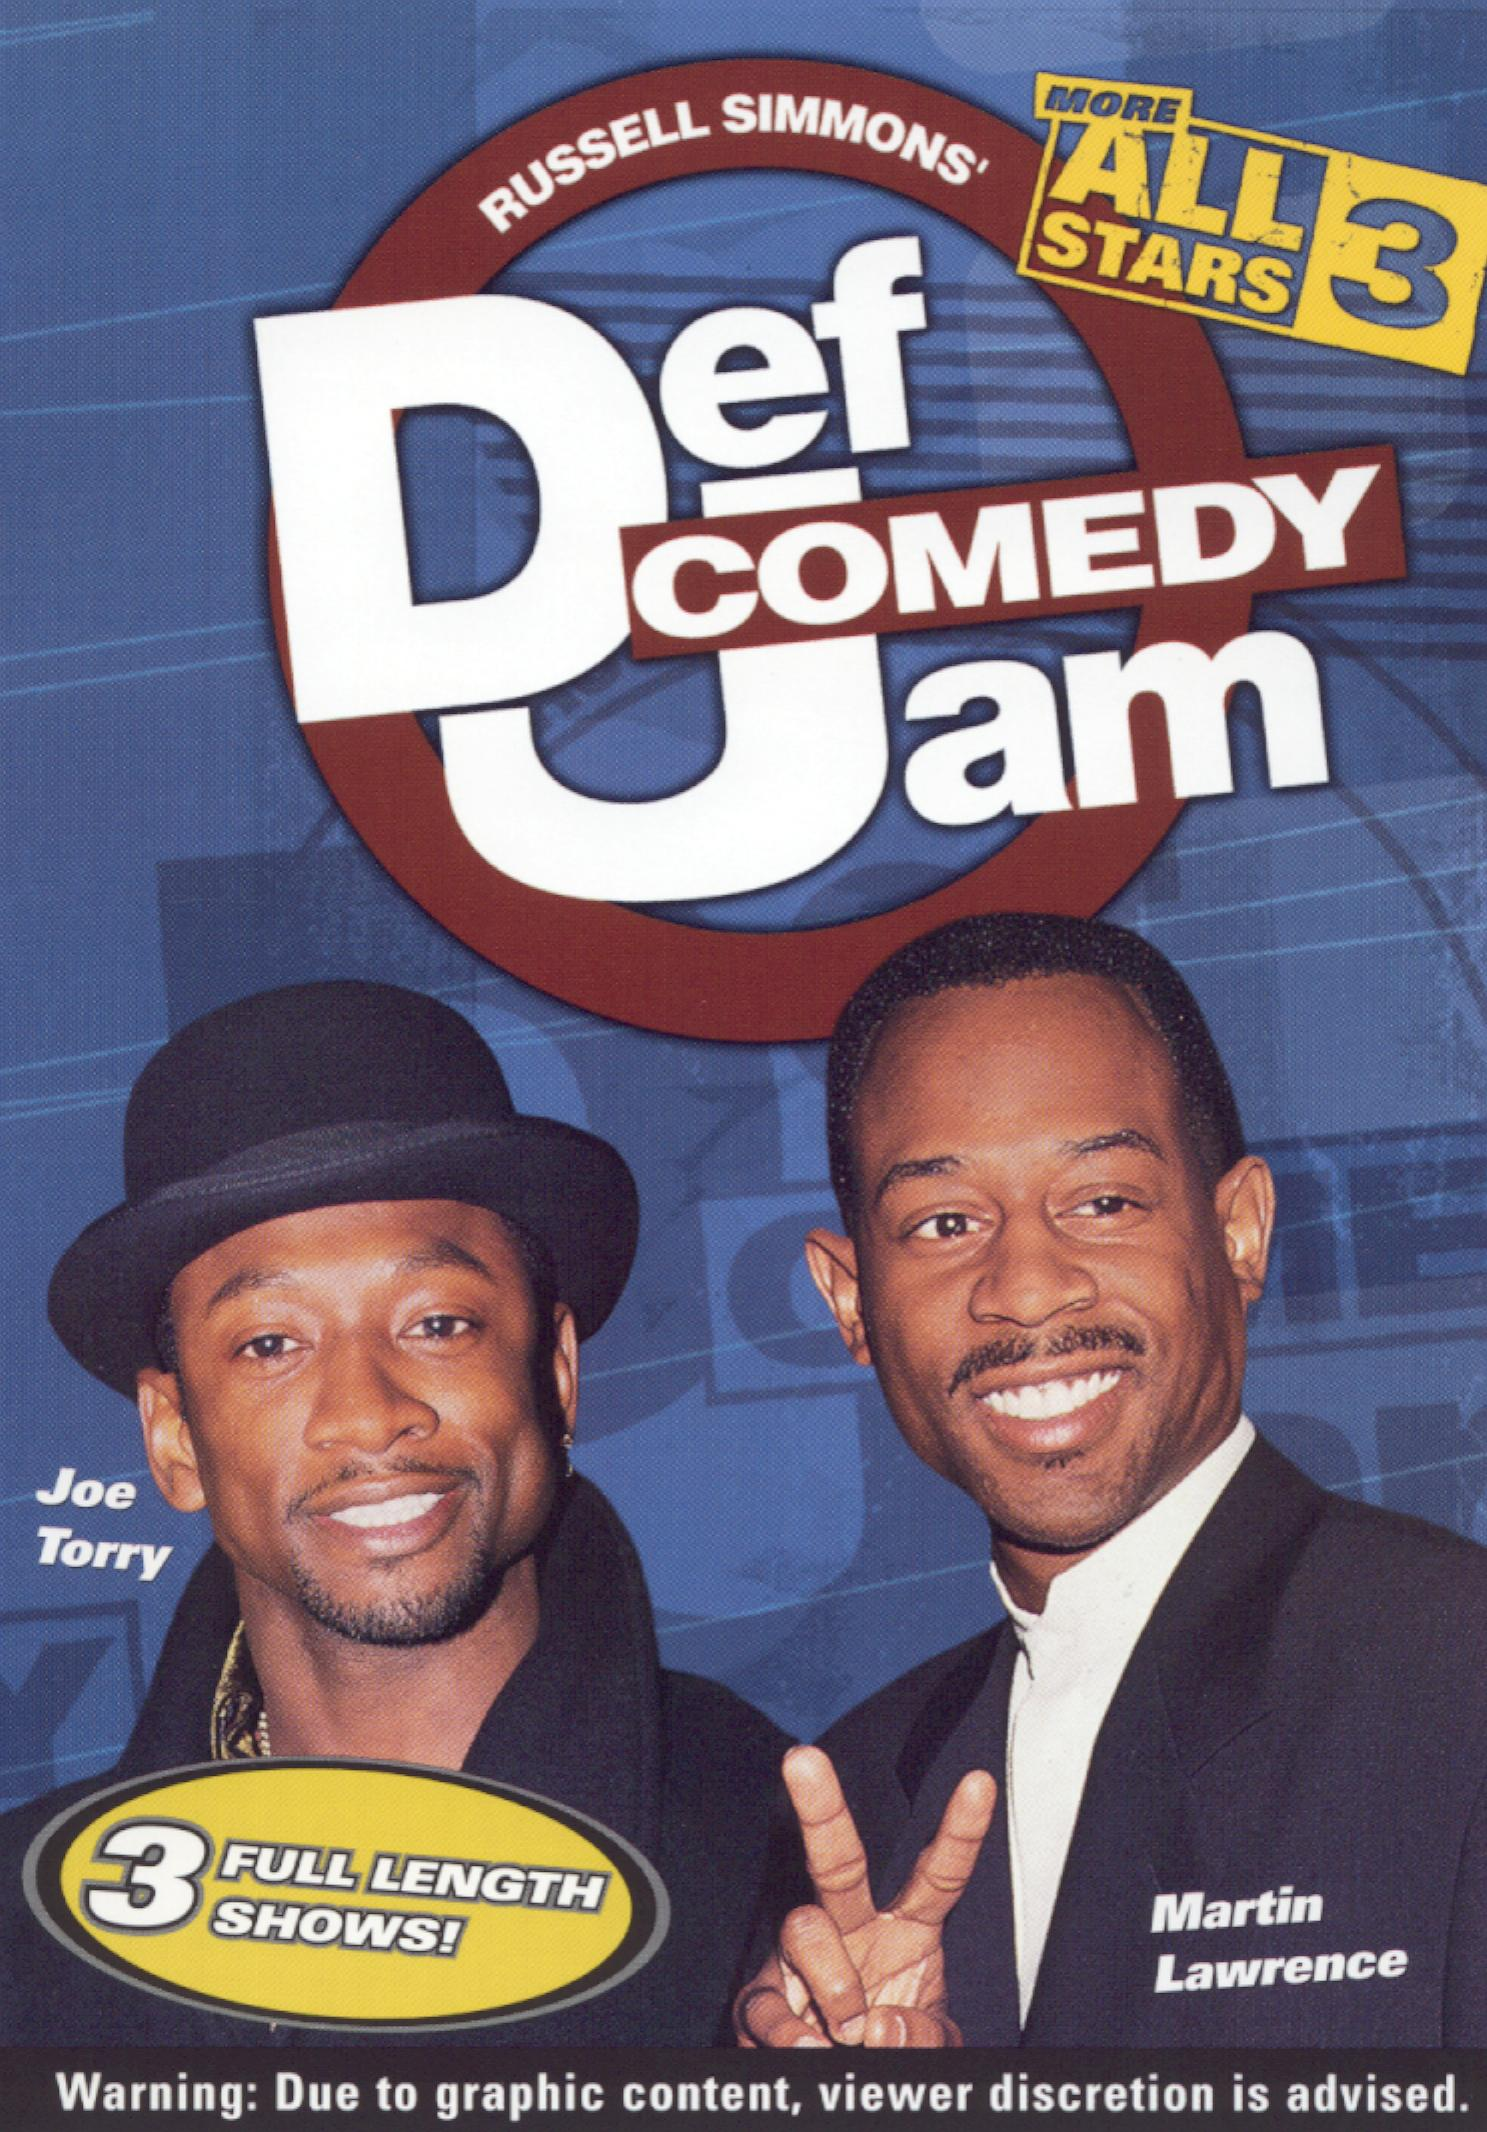 Def Comedy Jam: More All Stars, Vol. 3